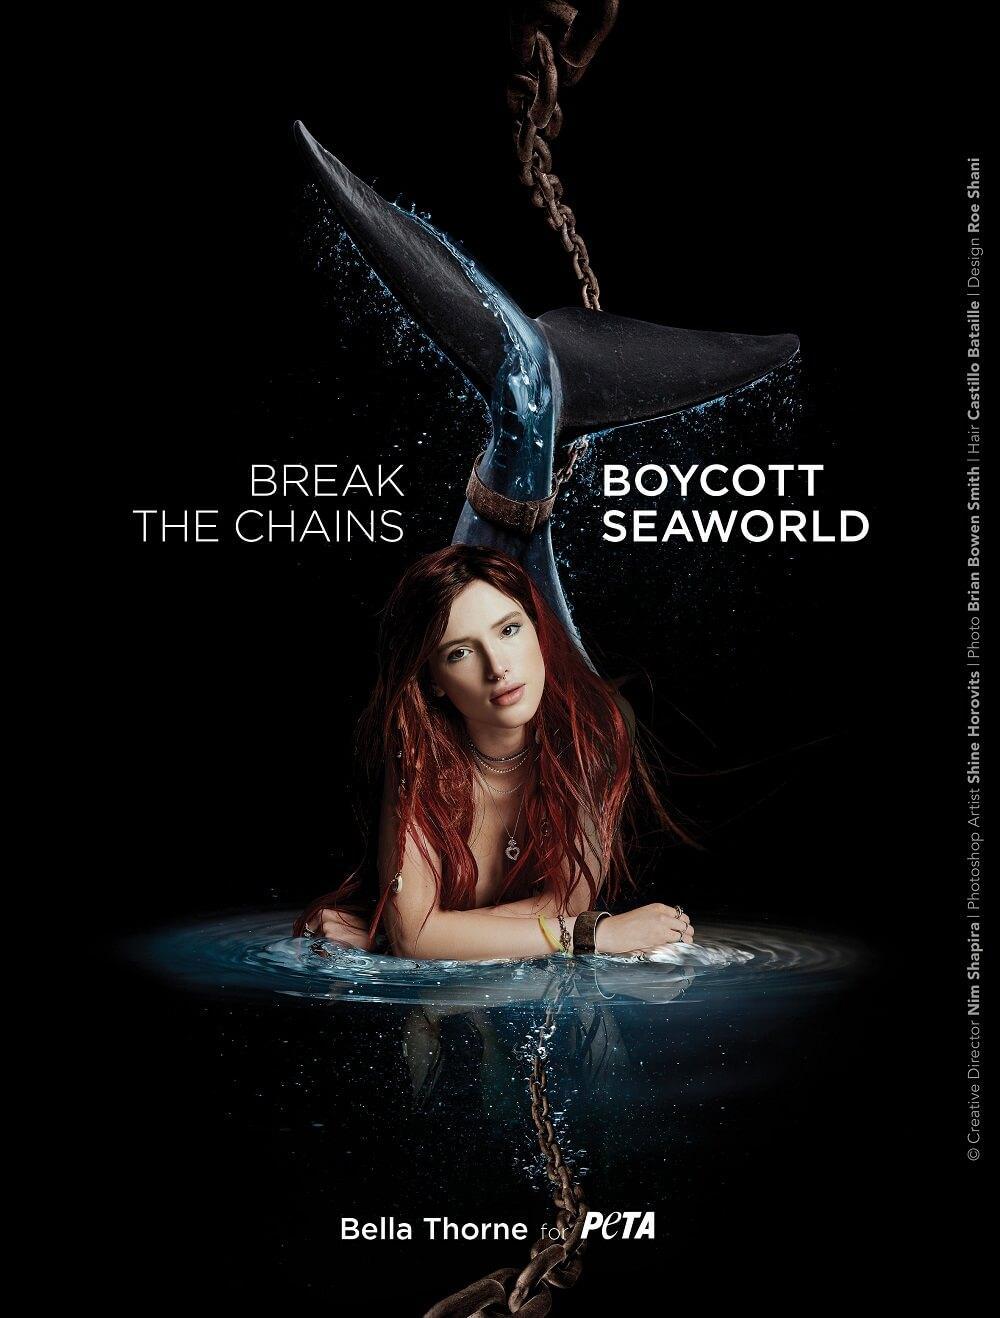 PETA Print Ad - Boycott SeaWorld